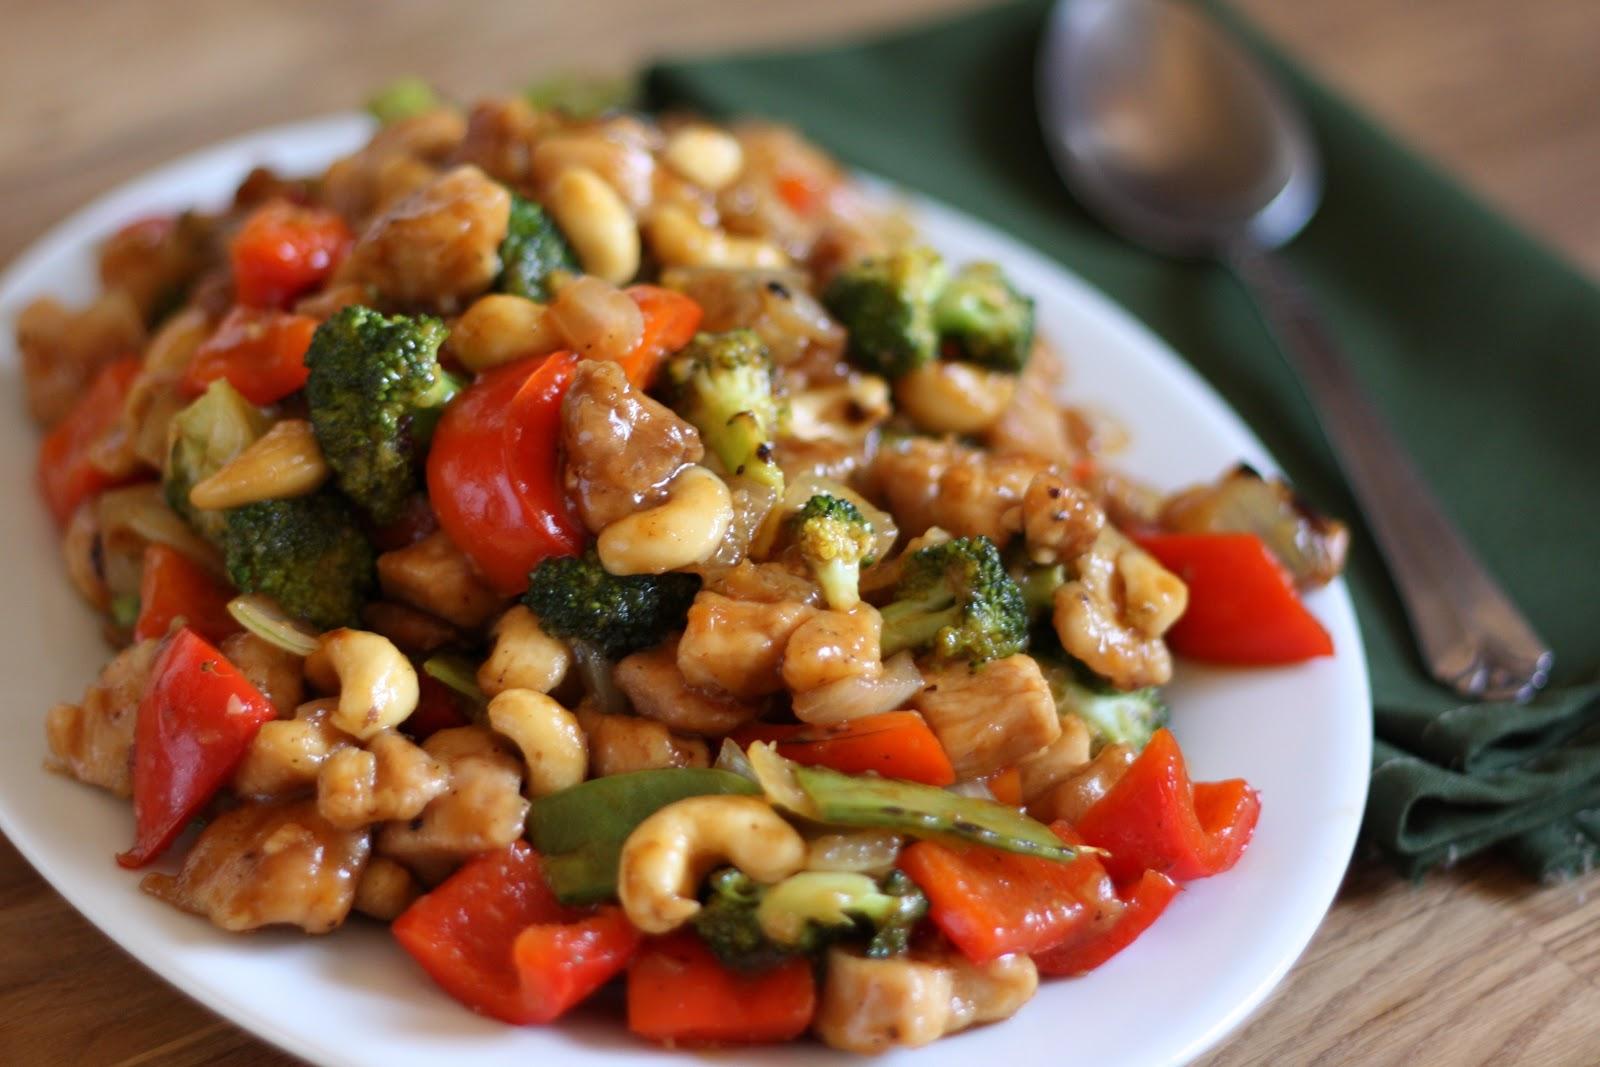 Barefeet In The Kitchen: Sriracha Honey Cashew Chicken